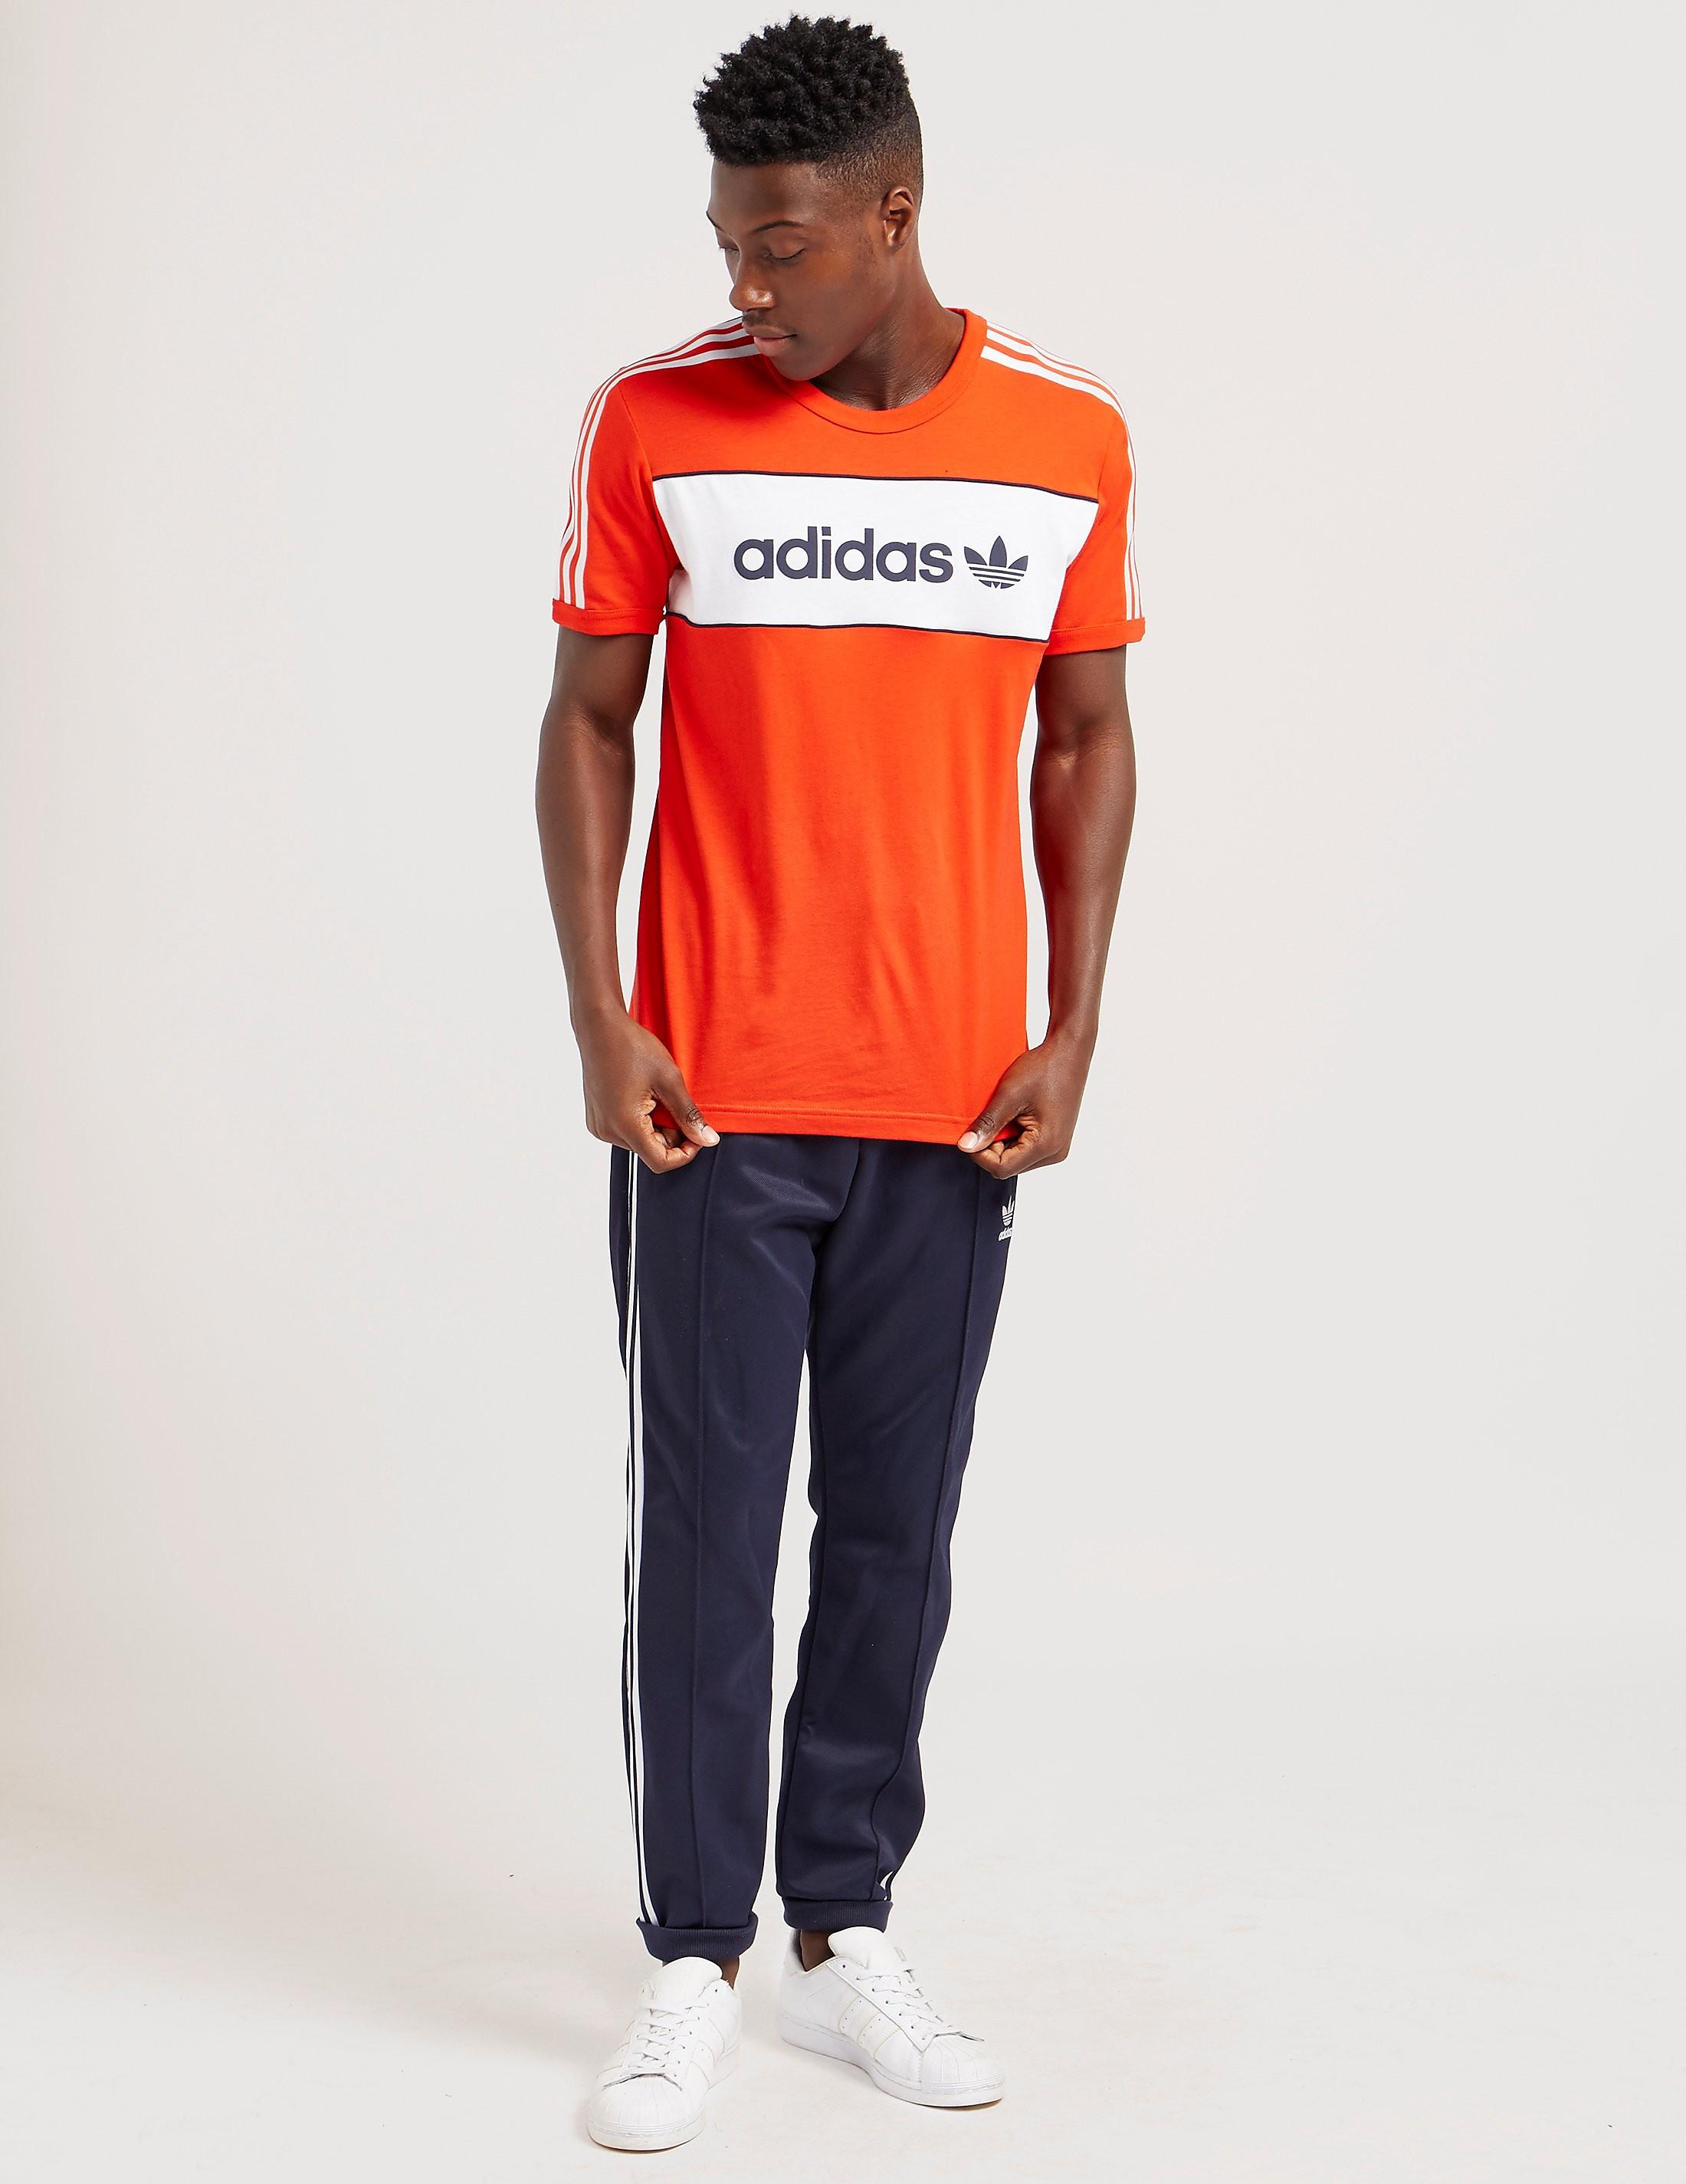 adidas Originals London T-Shirt